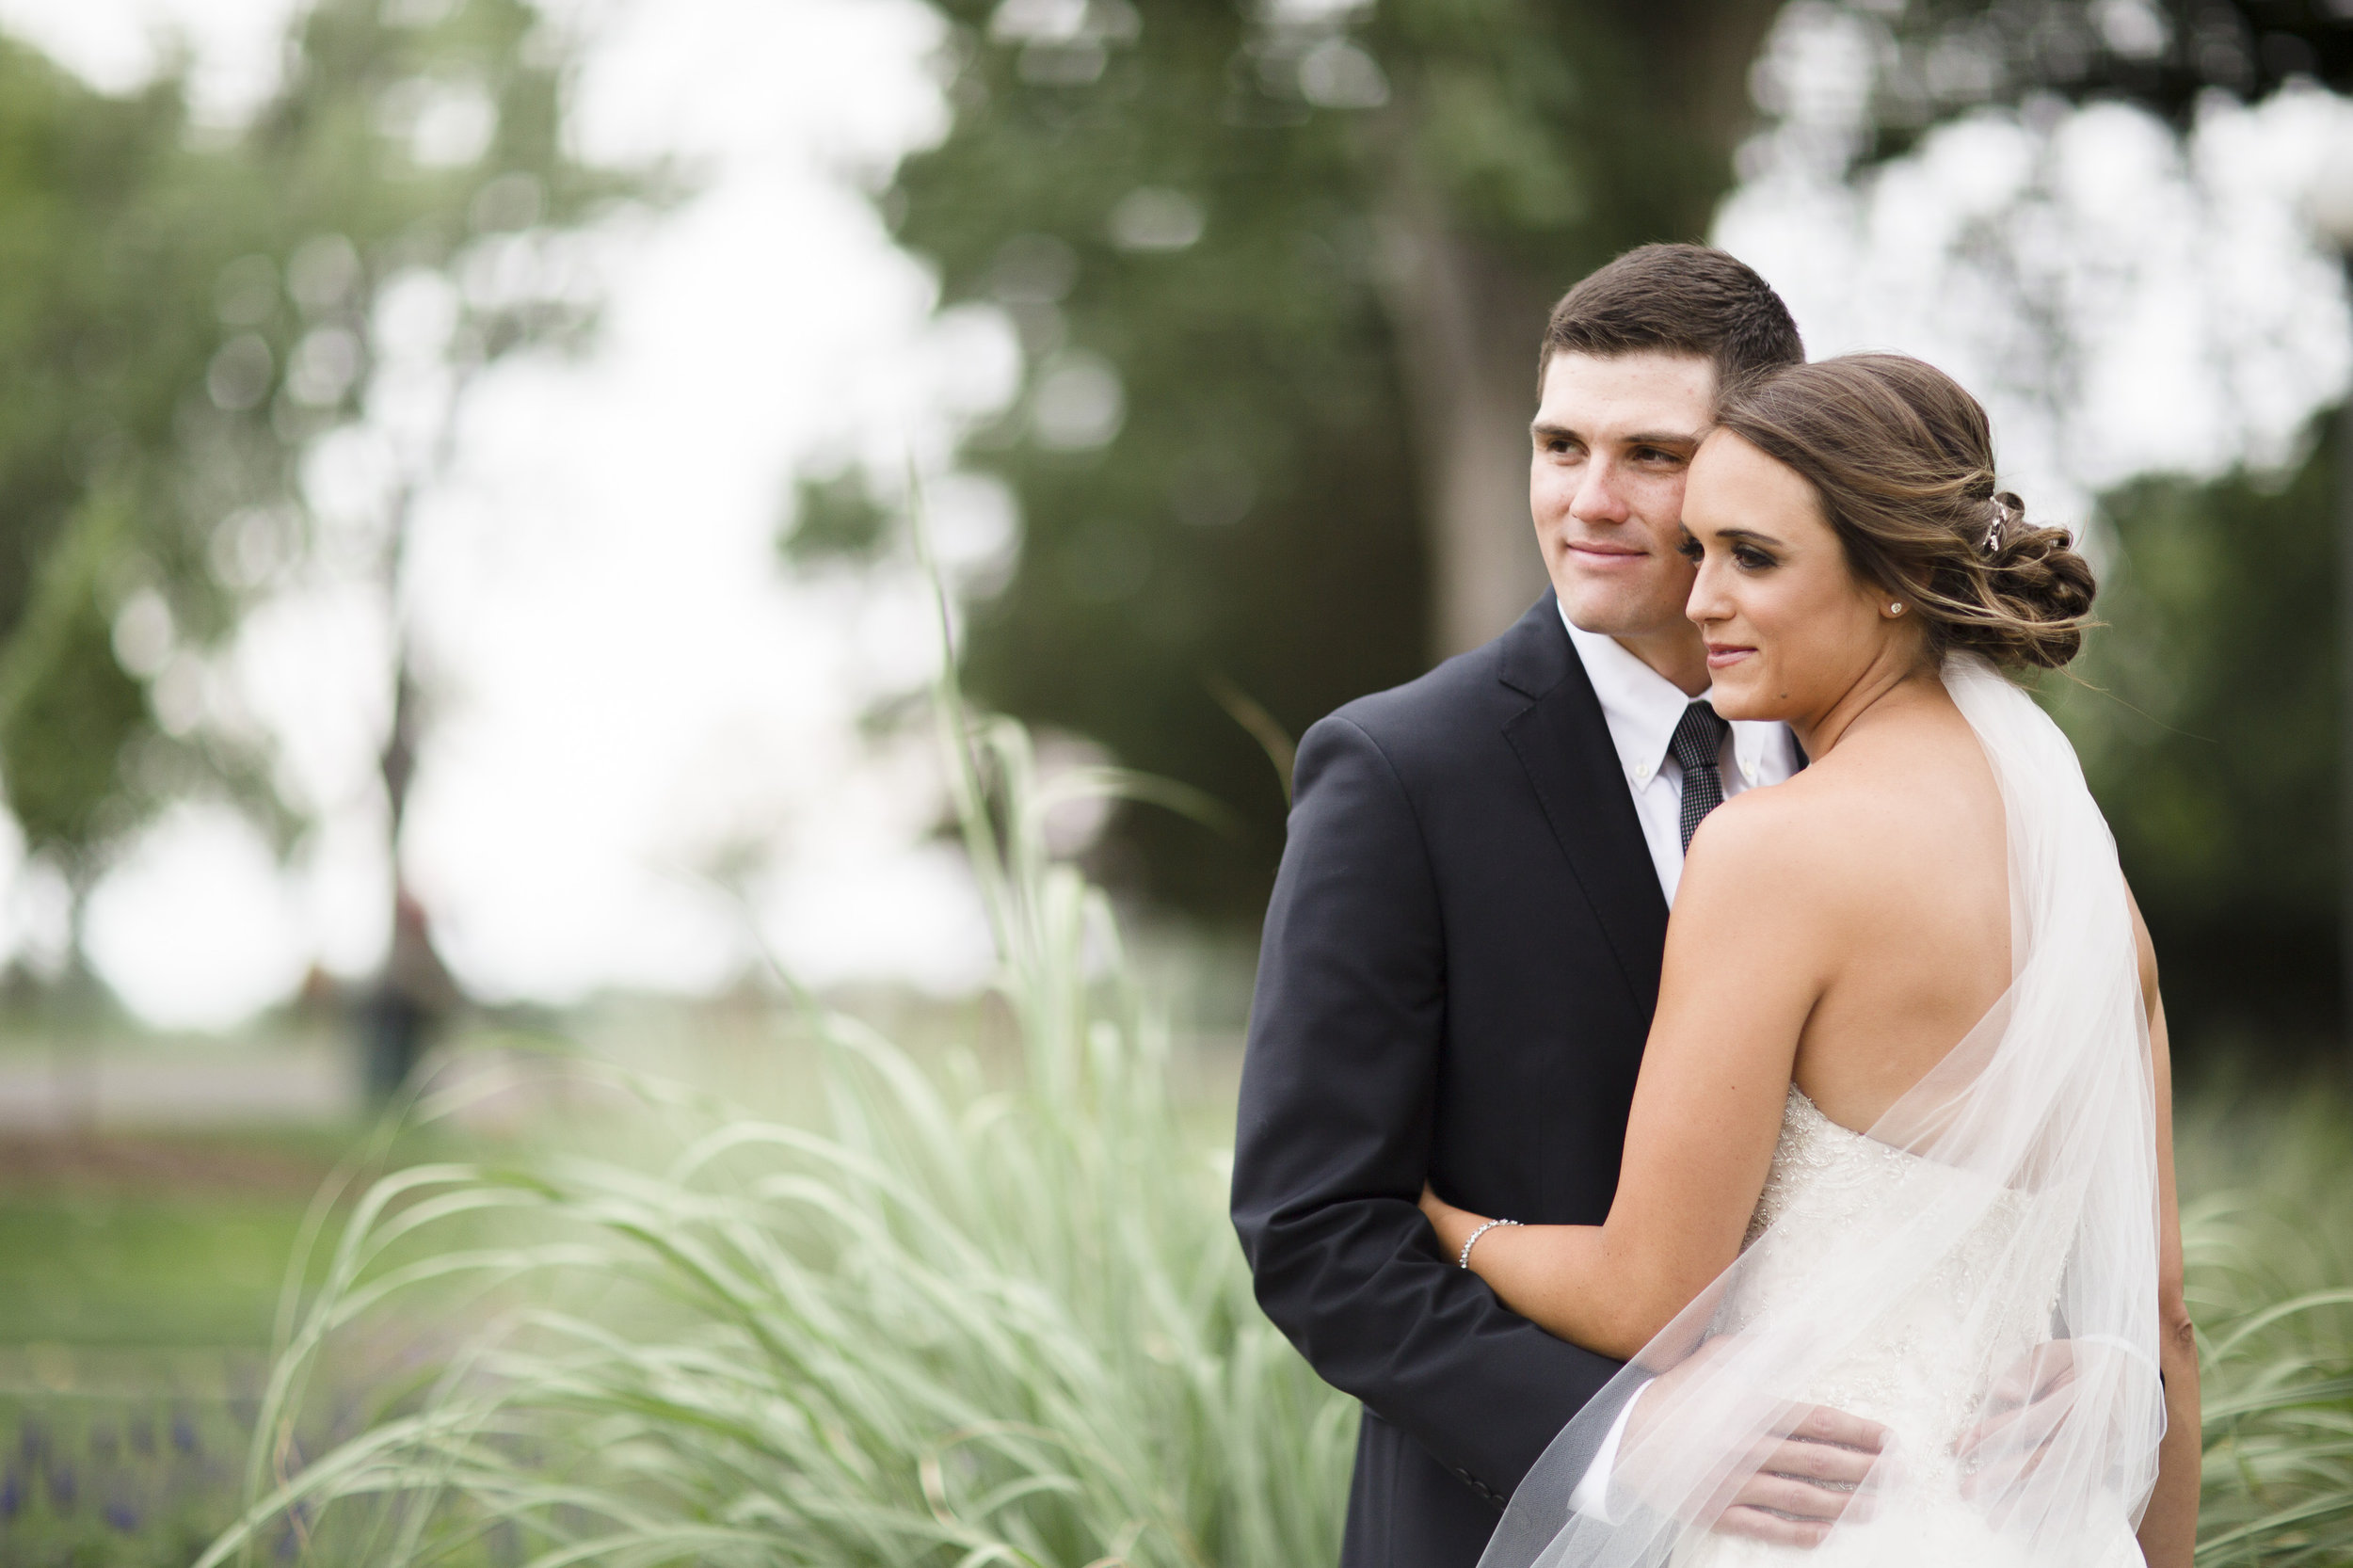 kristen-vance-wash-park-denver-colorado-wedding-2017-4.jpg